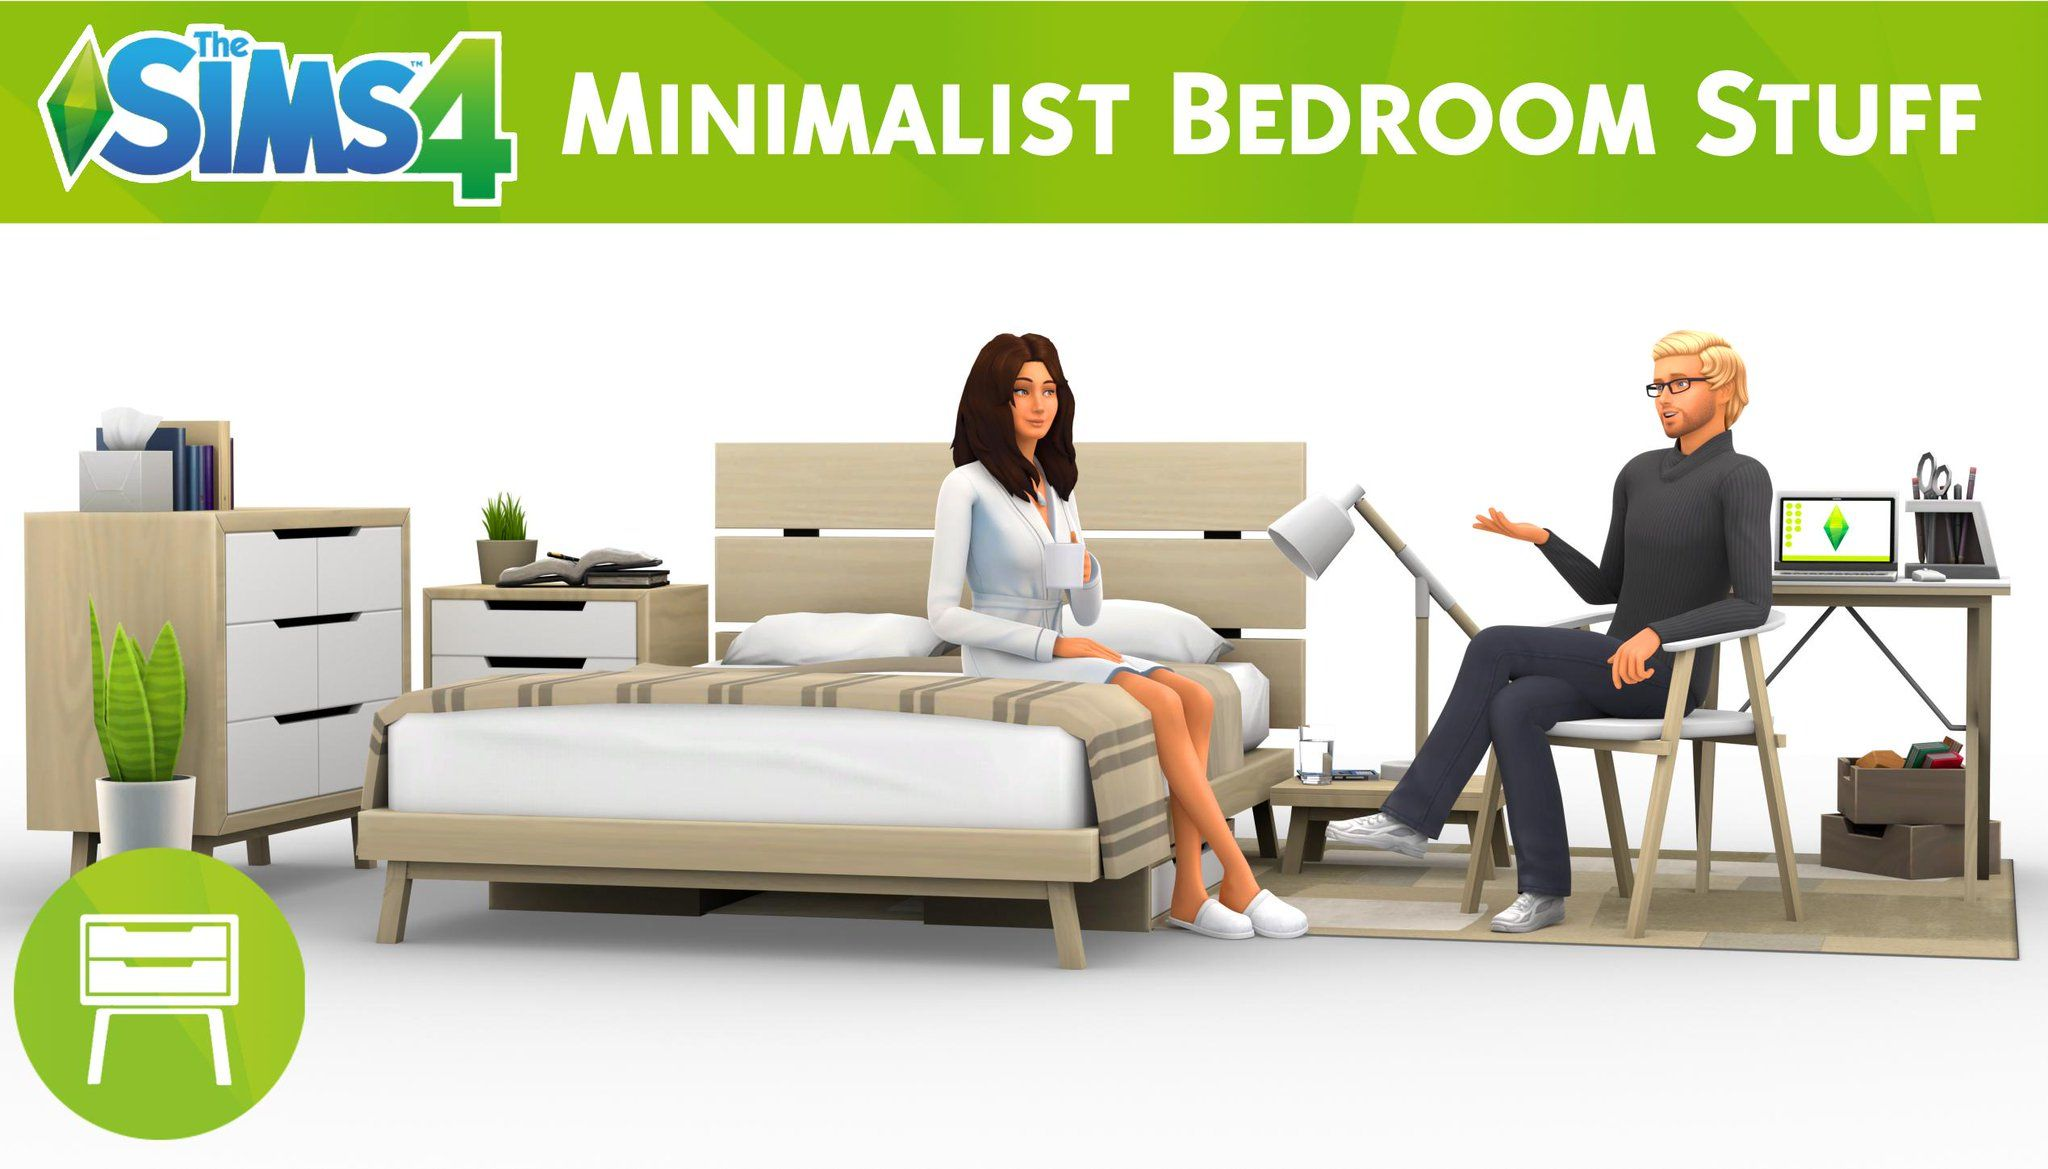 The Sims 4 Minimalist Bedroom Fanmade Custom Stuff Pack